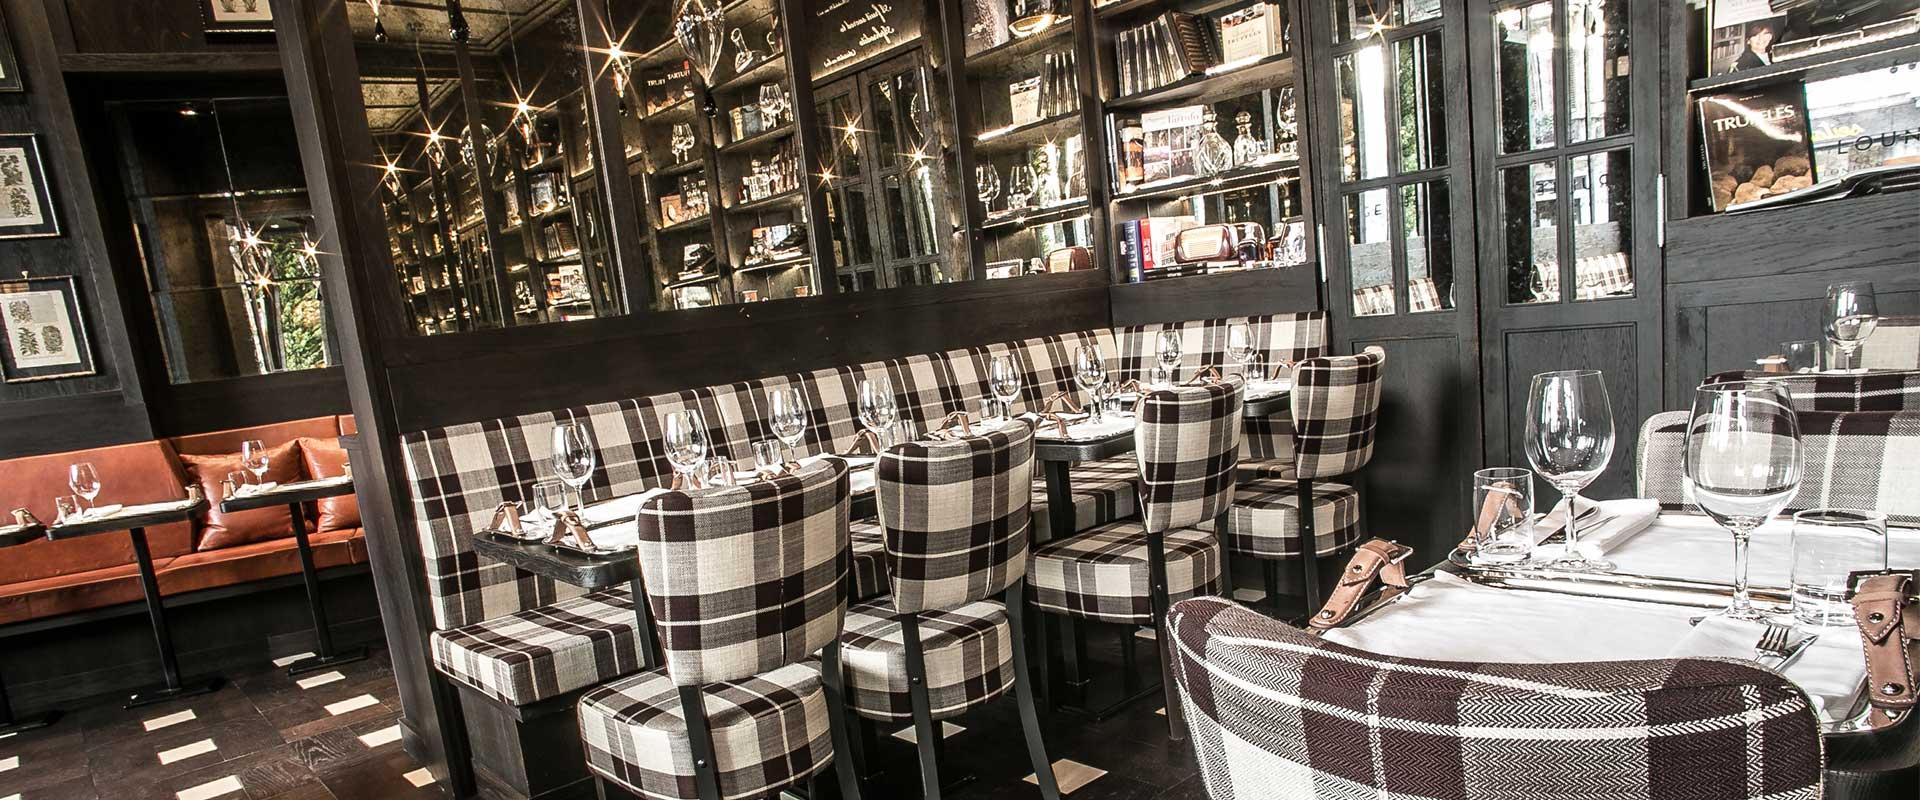 tartufi-milano-ristorante-3